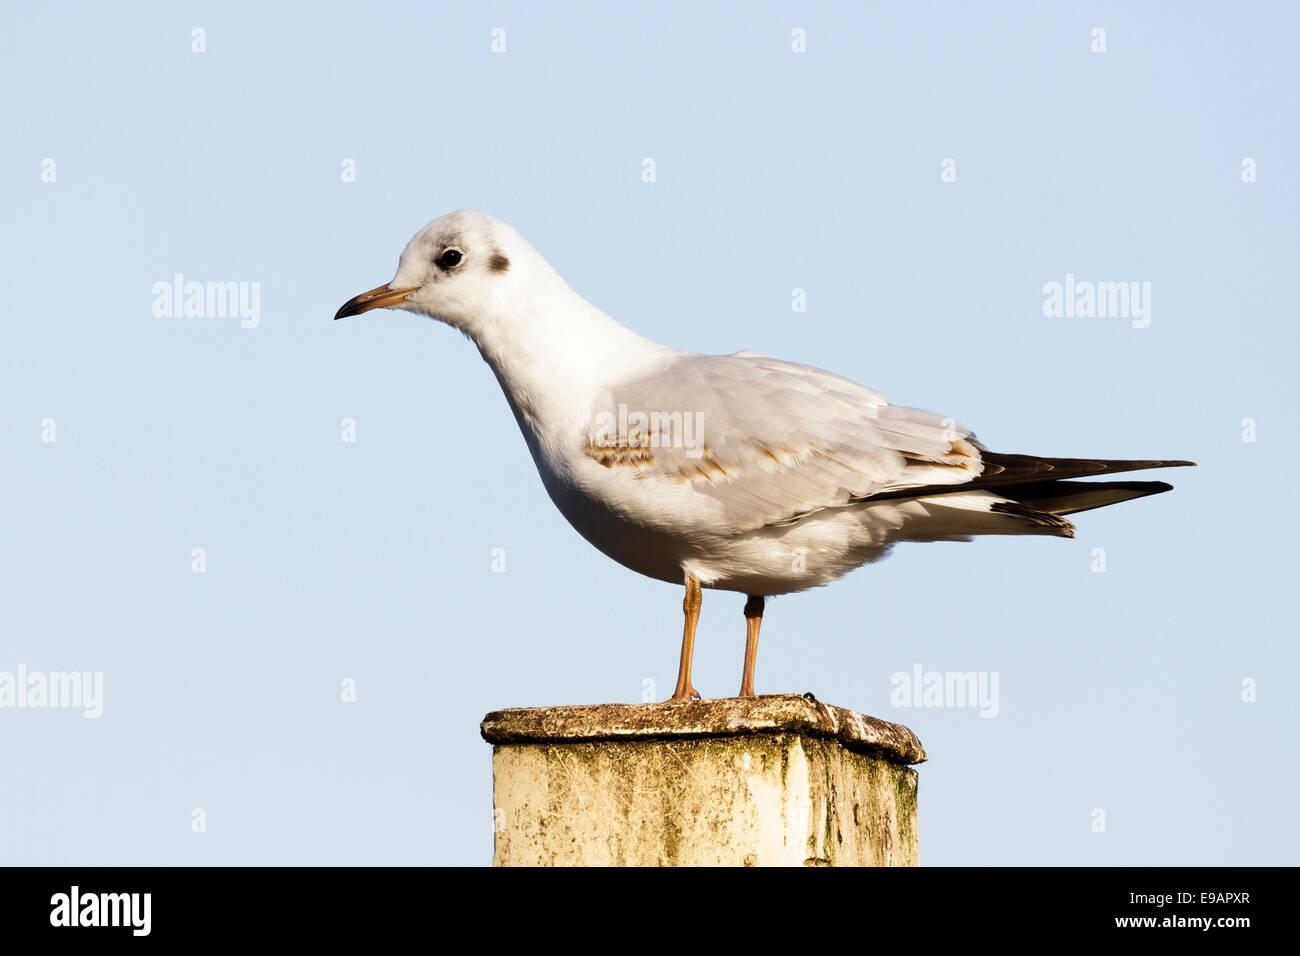 Black headed gull (Chroicocephalus ridibundus) - Stock Image